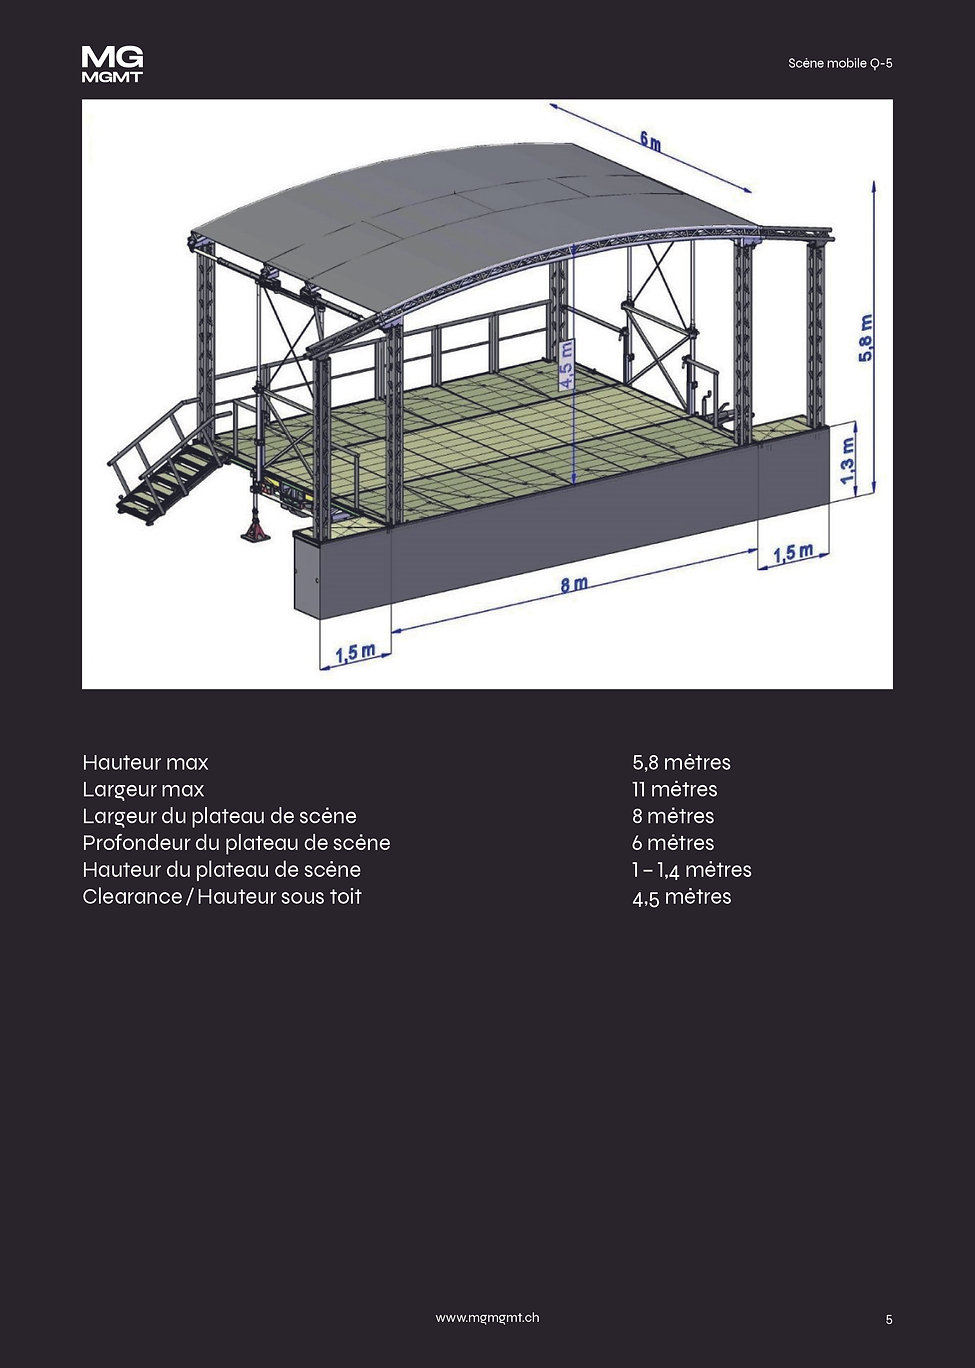 brochure_mgmt_20200223-5.jpg